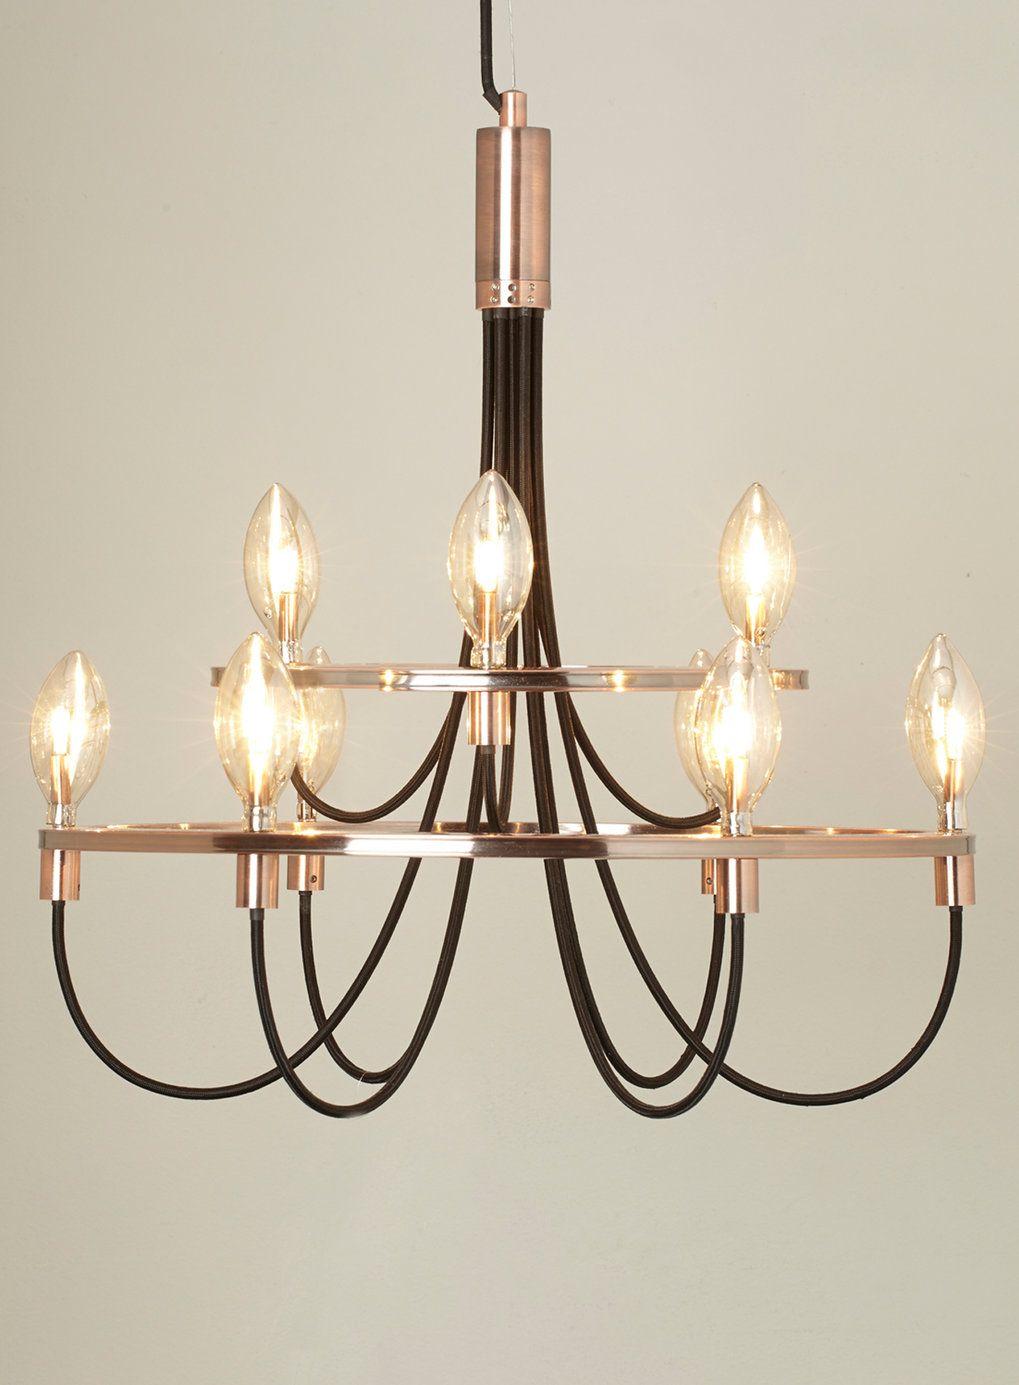 Photo 1 of Frederica candelabra in copper | Luminaires | Pinterest